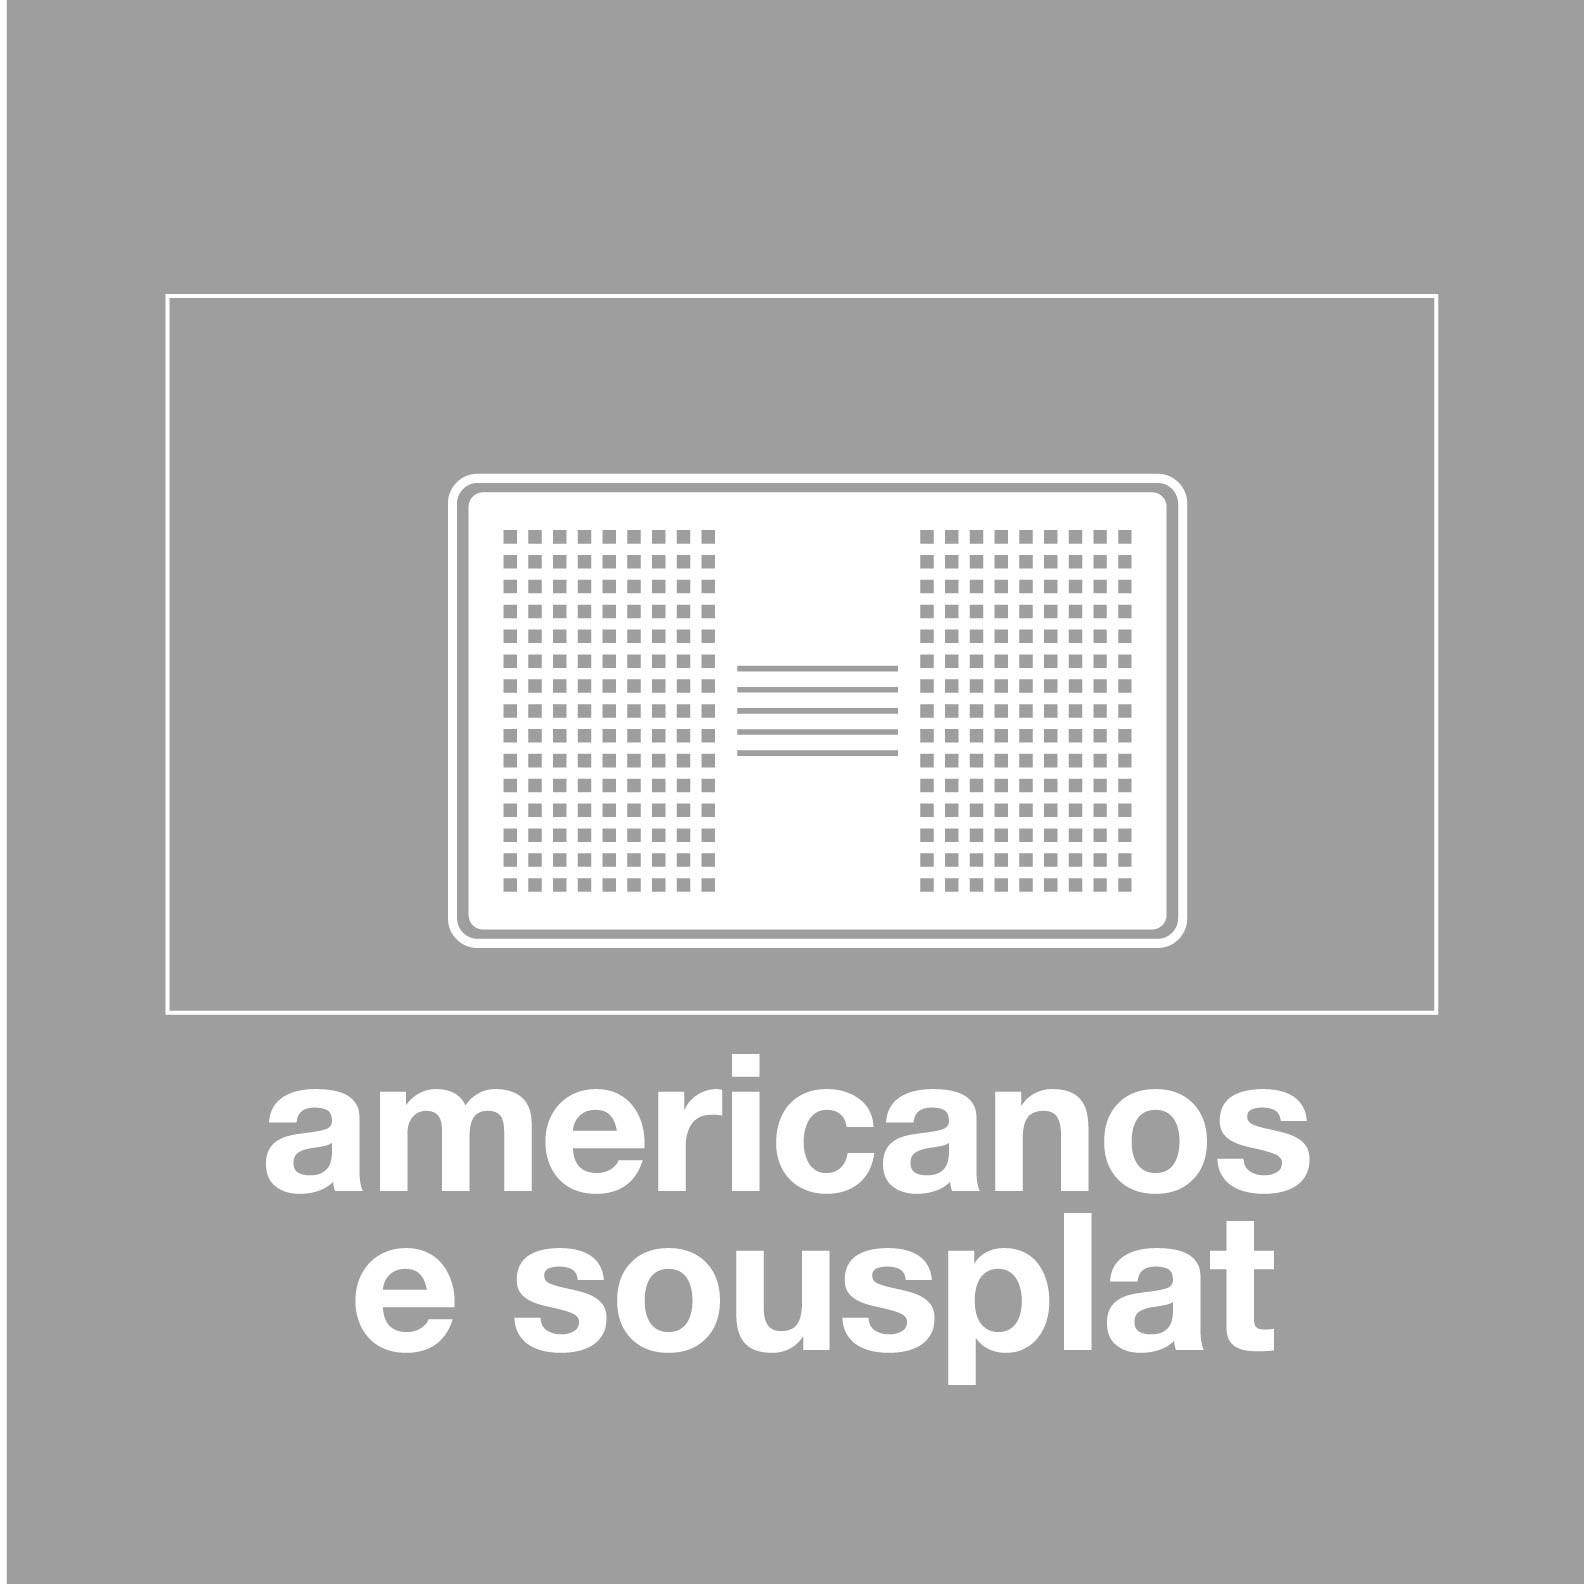 Americanos e Sousplat